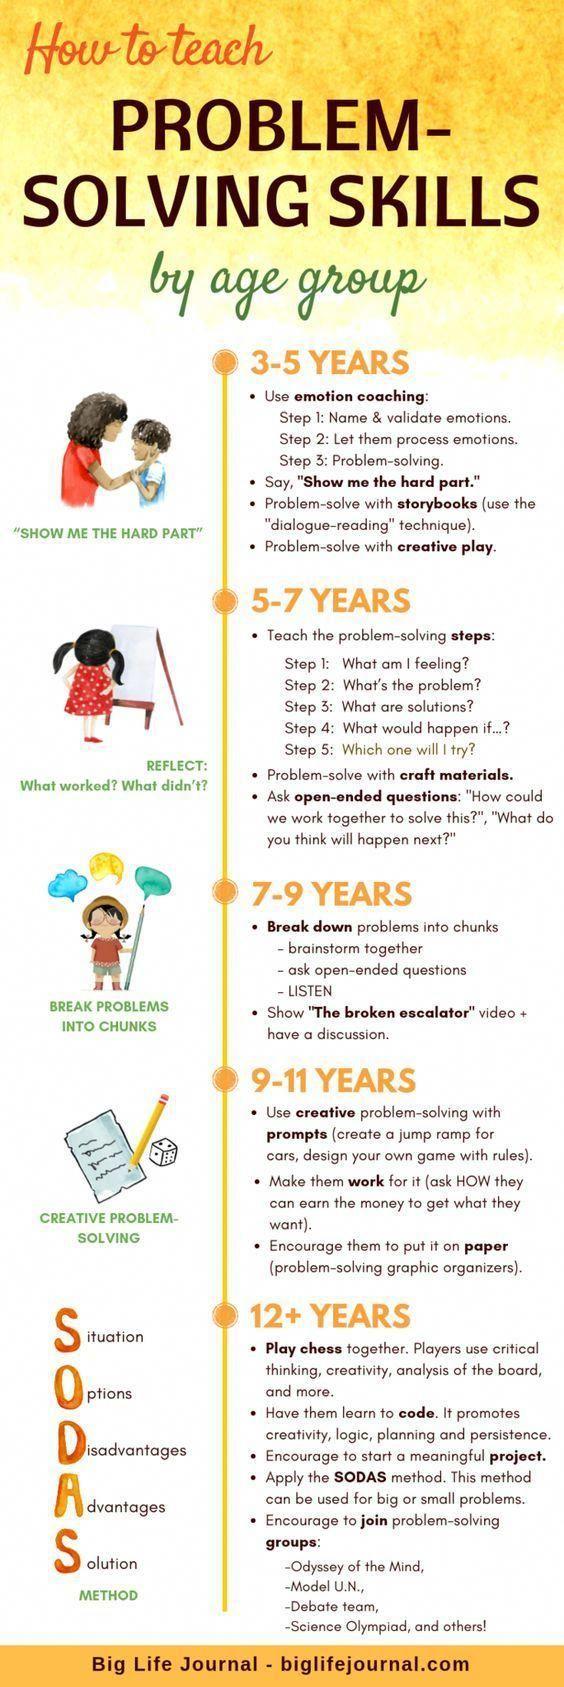 Self Esteem Confidence Kit Pdf Ages 5 11 Parenting Skills Parenting Kids Learning